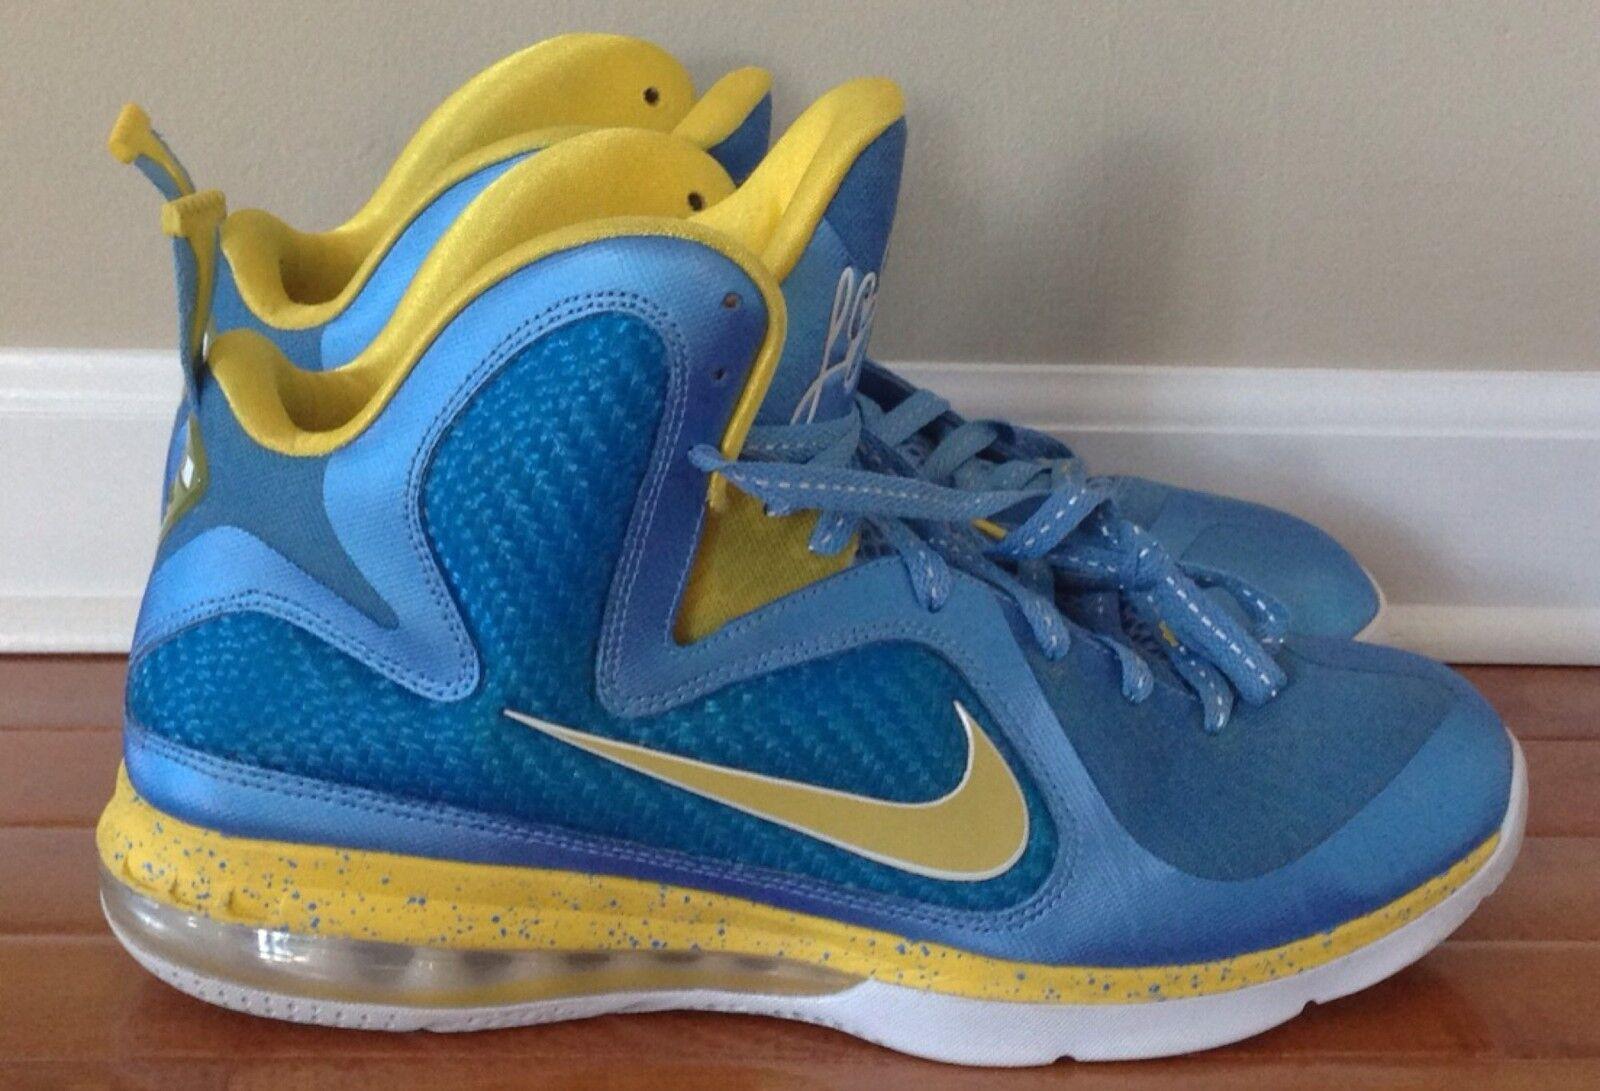 Nike Lebron 9 Swin Cash Sample PE Sz 12